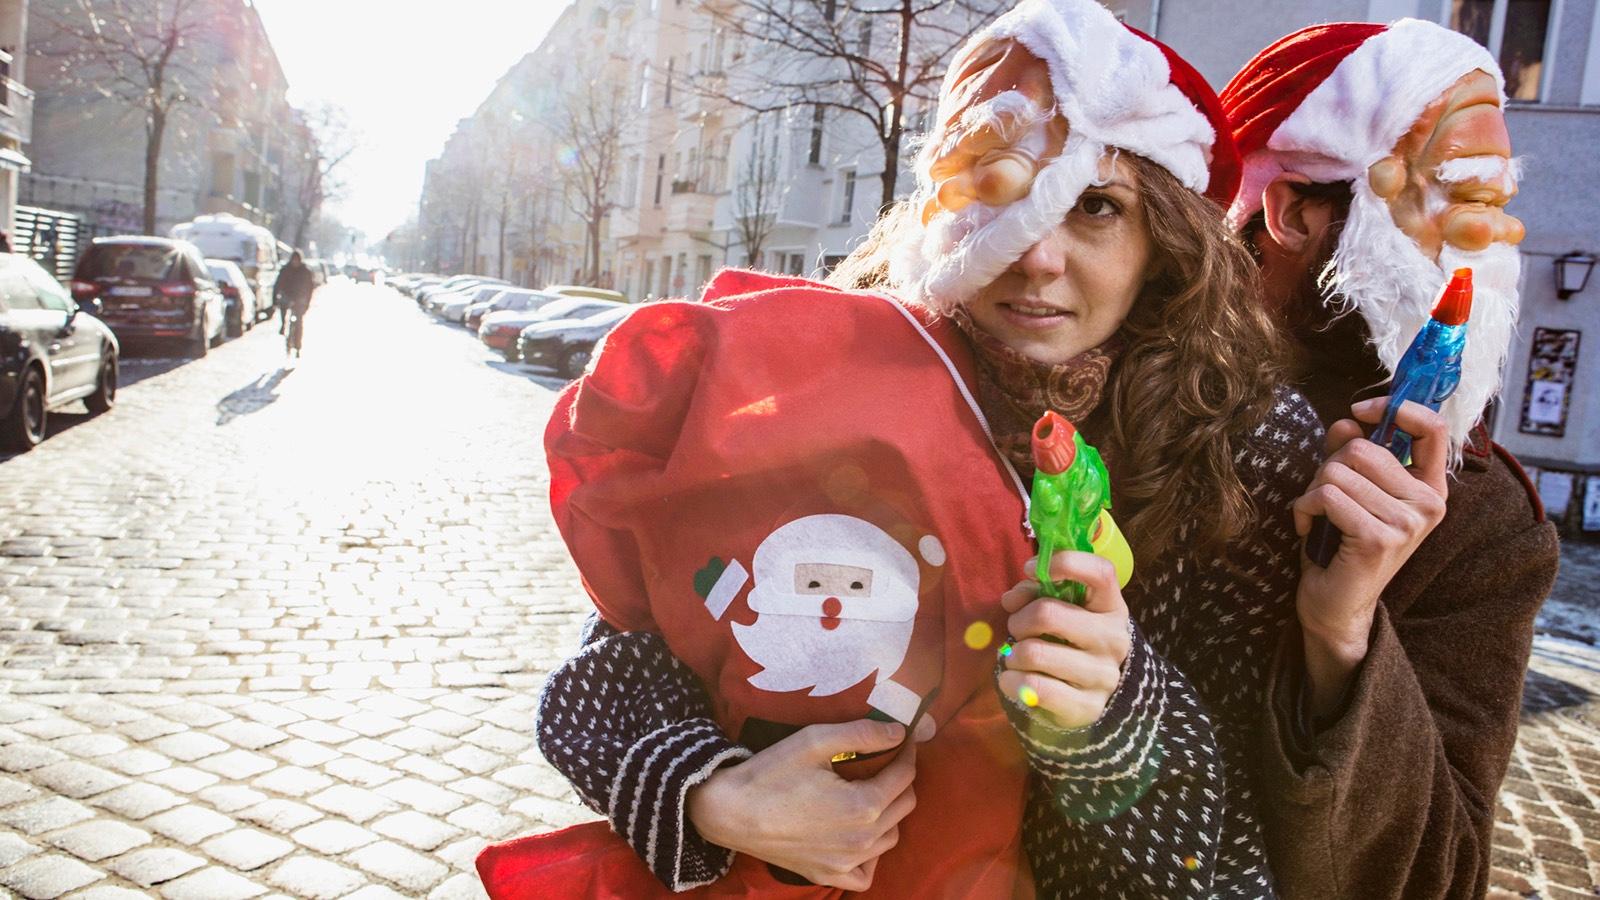 Comedy satire Santa robbers on street